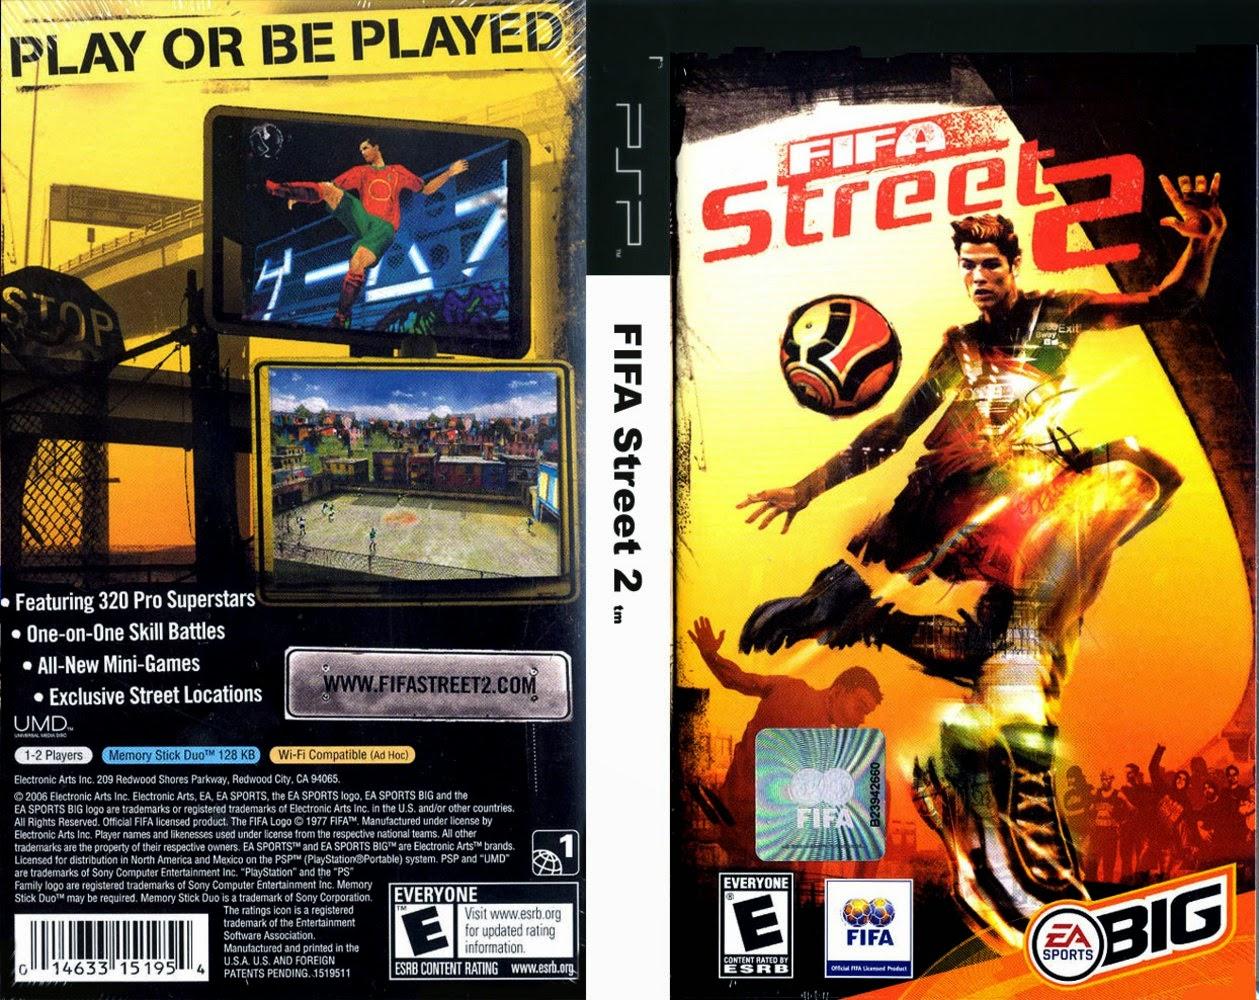 تحميل لعبة fifa street 2 برابط مباشر